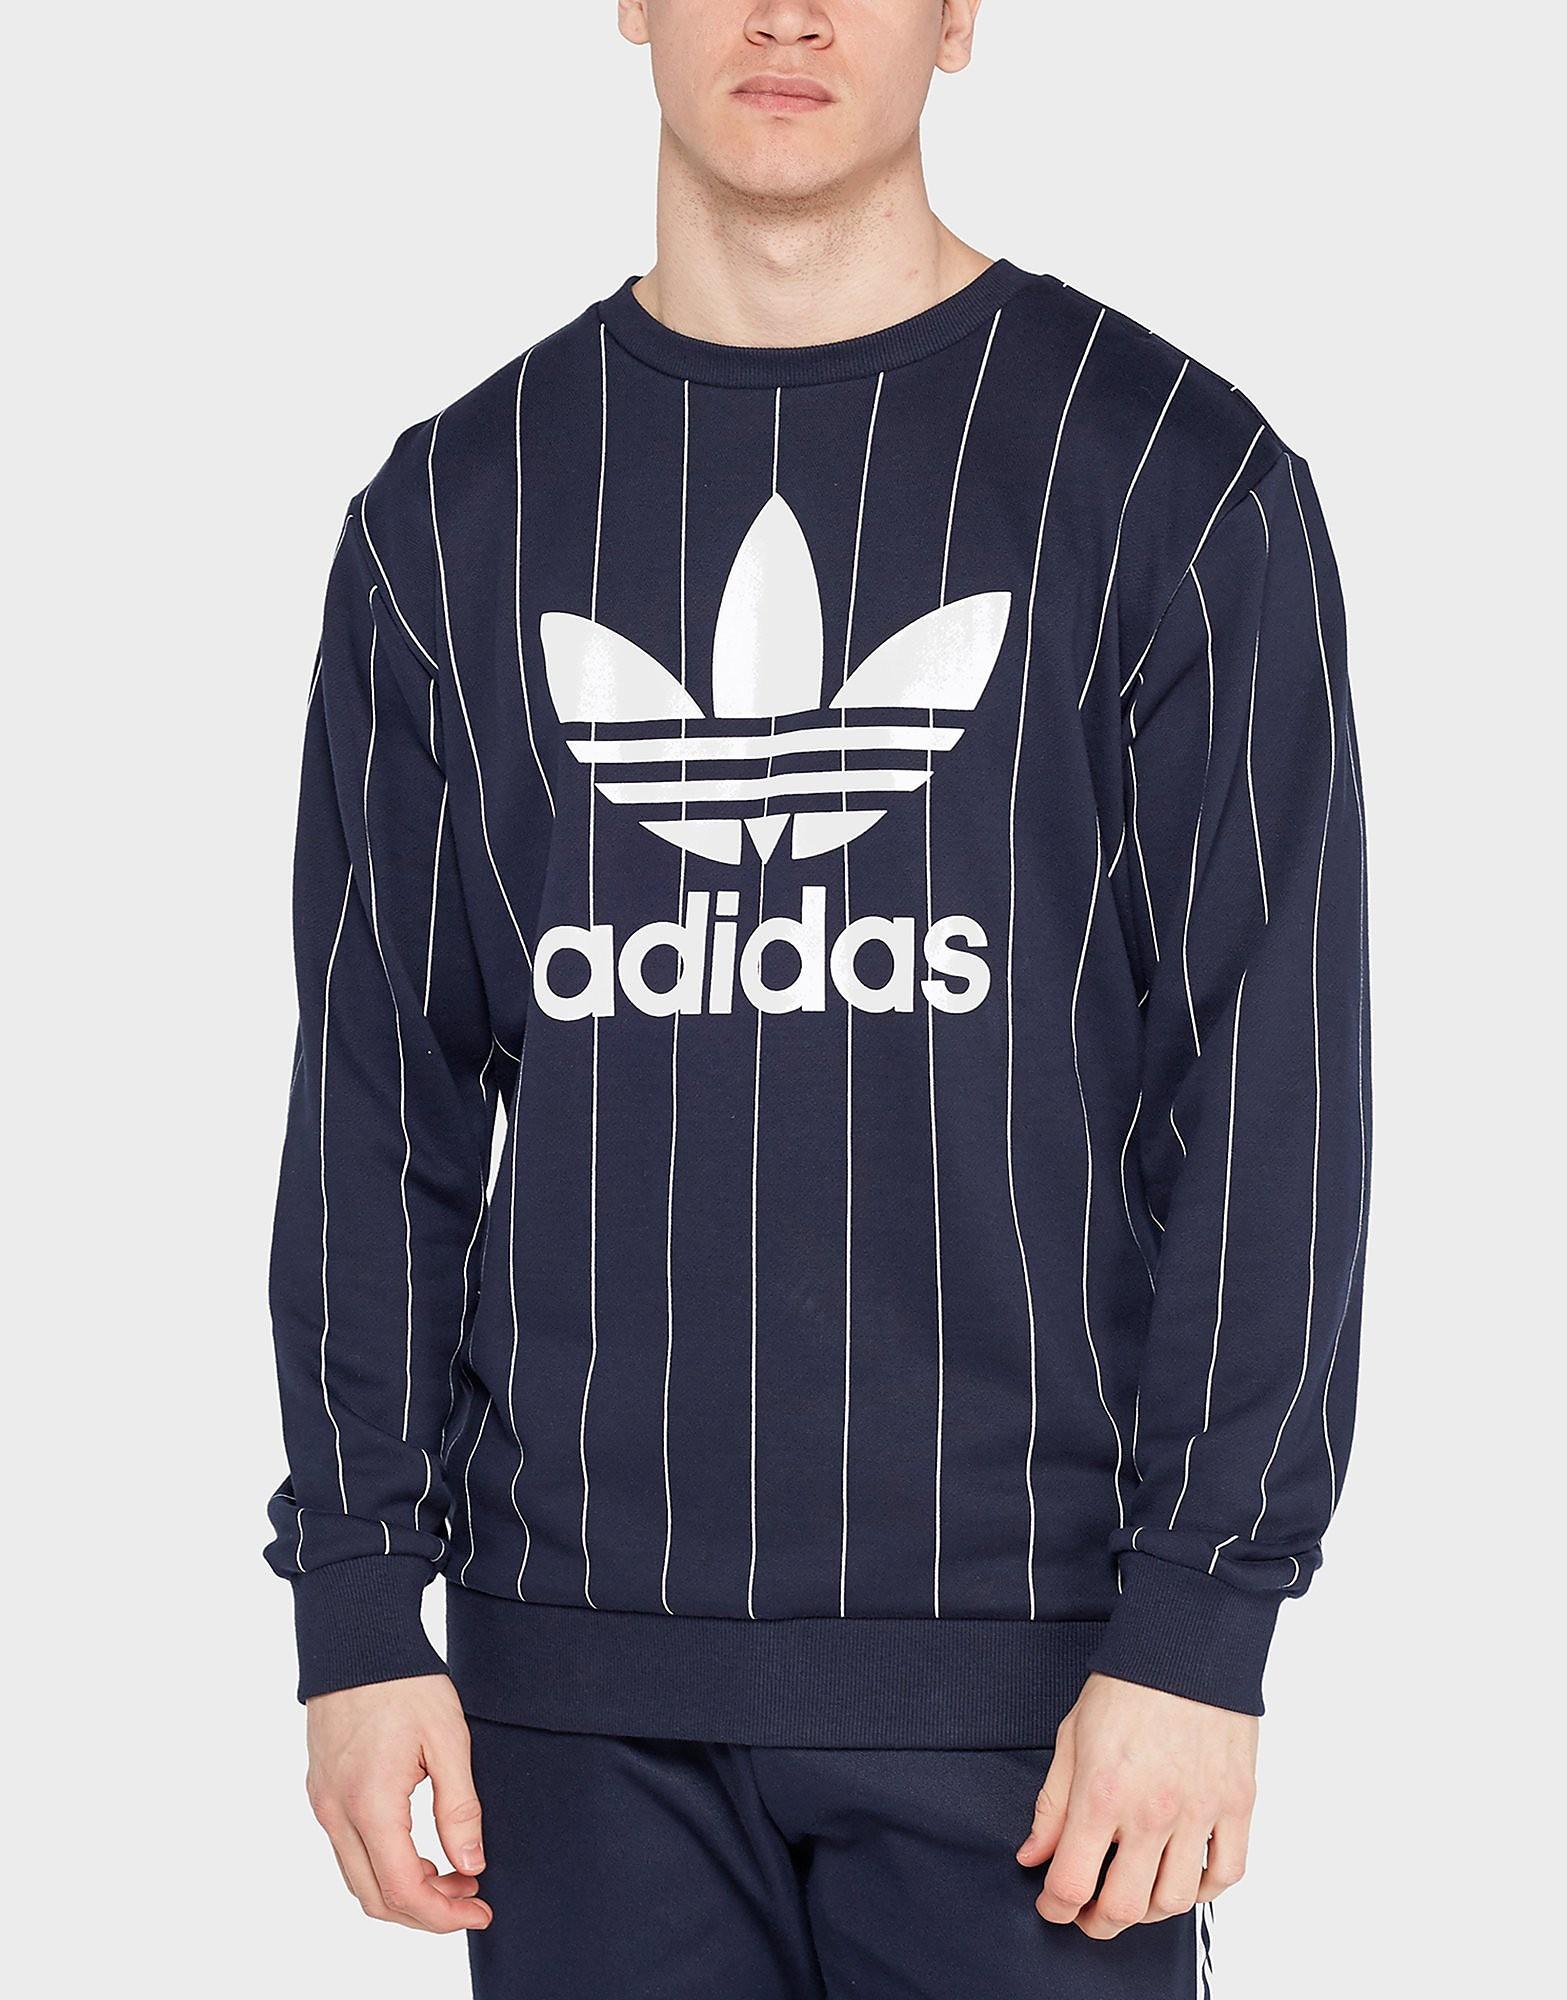 adidas Originals Tokyo Pinstripe Sweatshirt